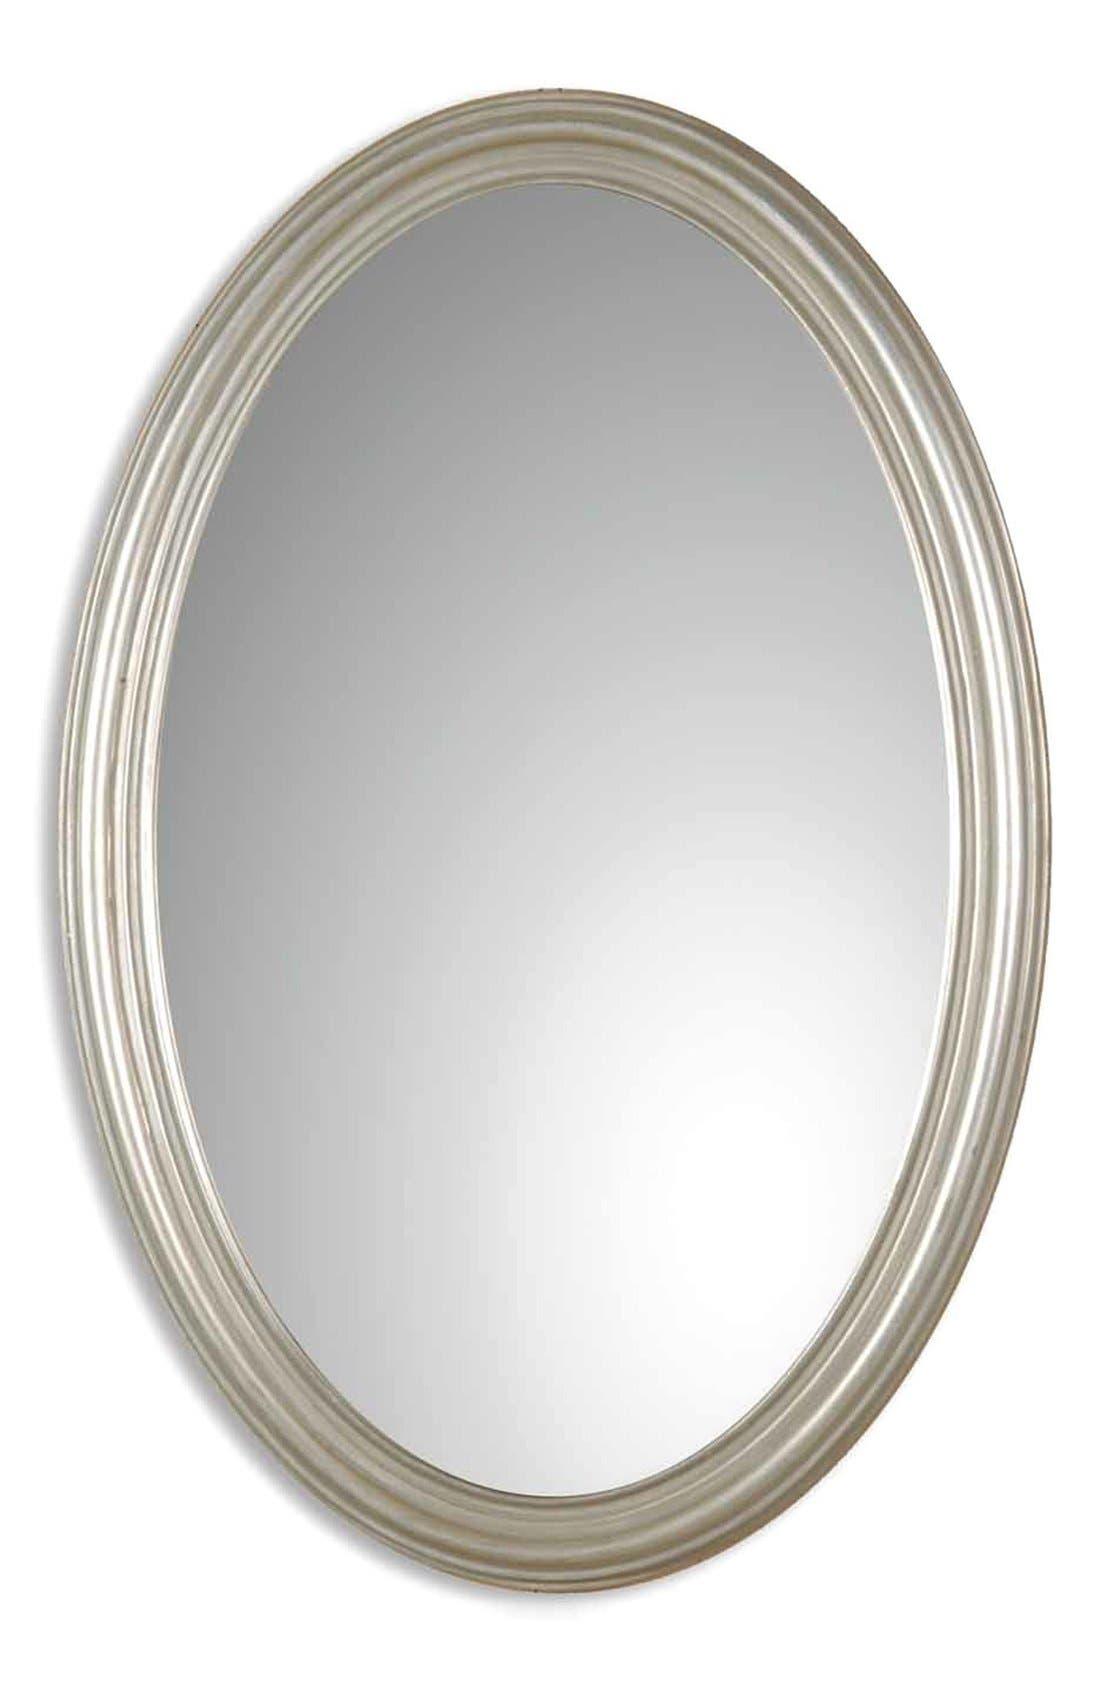 uttermost wall mirror - Uttermost Mirrors